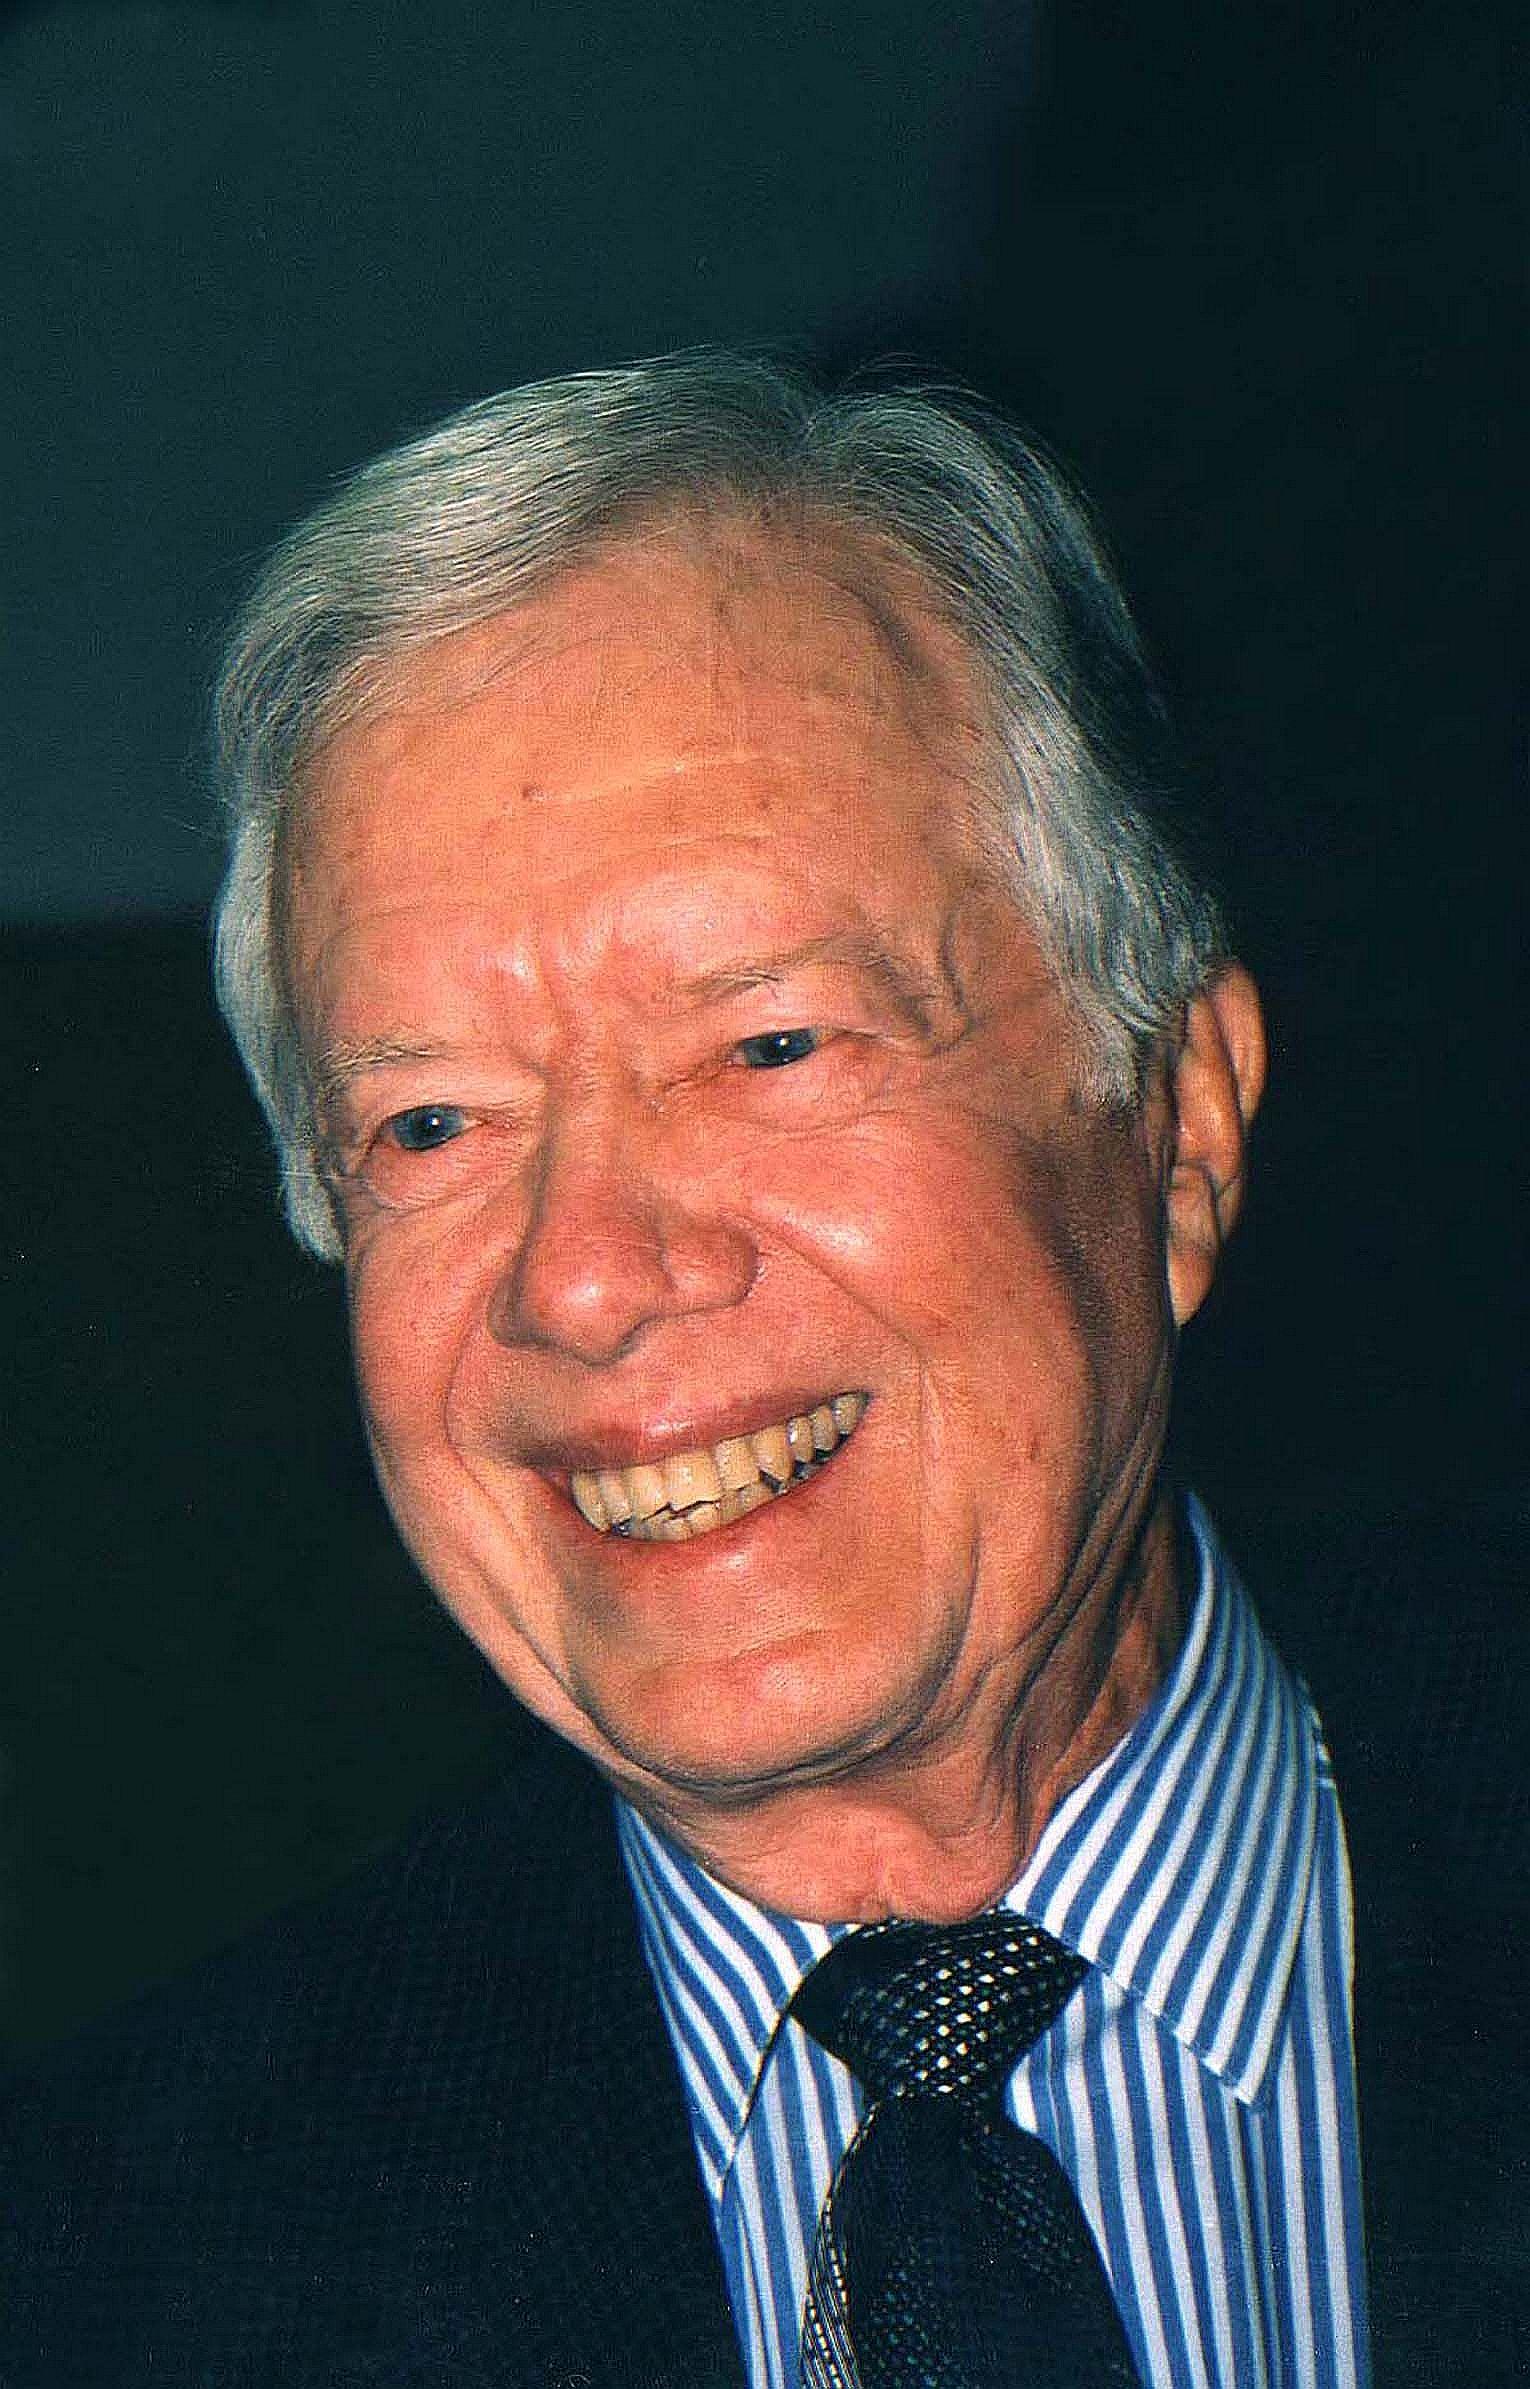 Poet Jimmy Carter